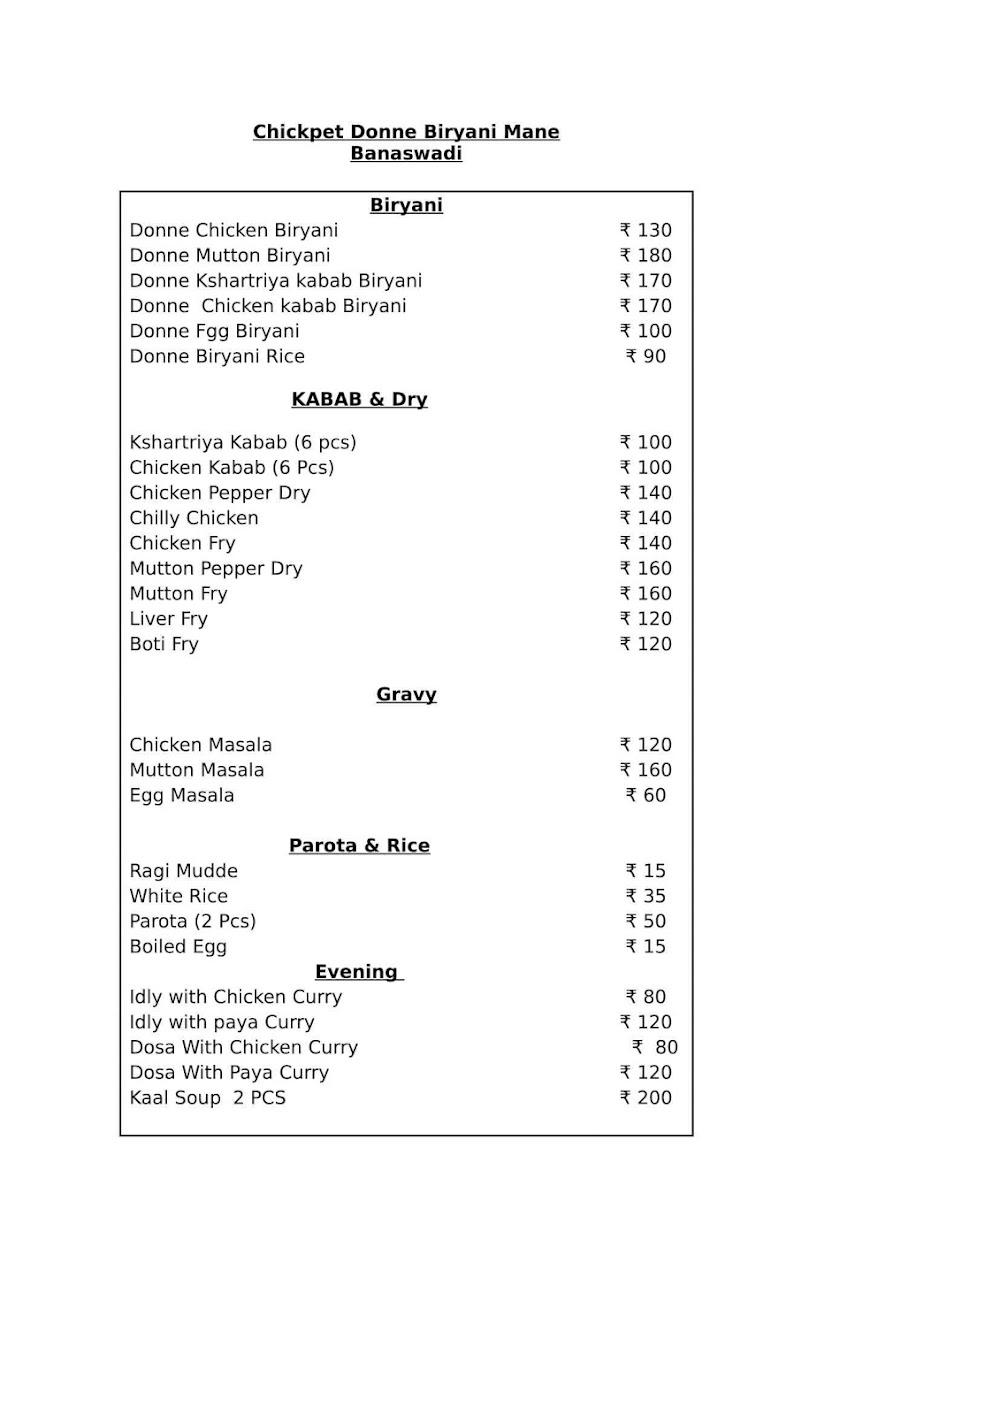 Chickpet Donne Biriyani Mane menu 1